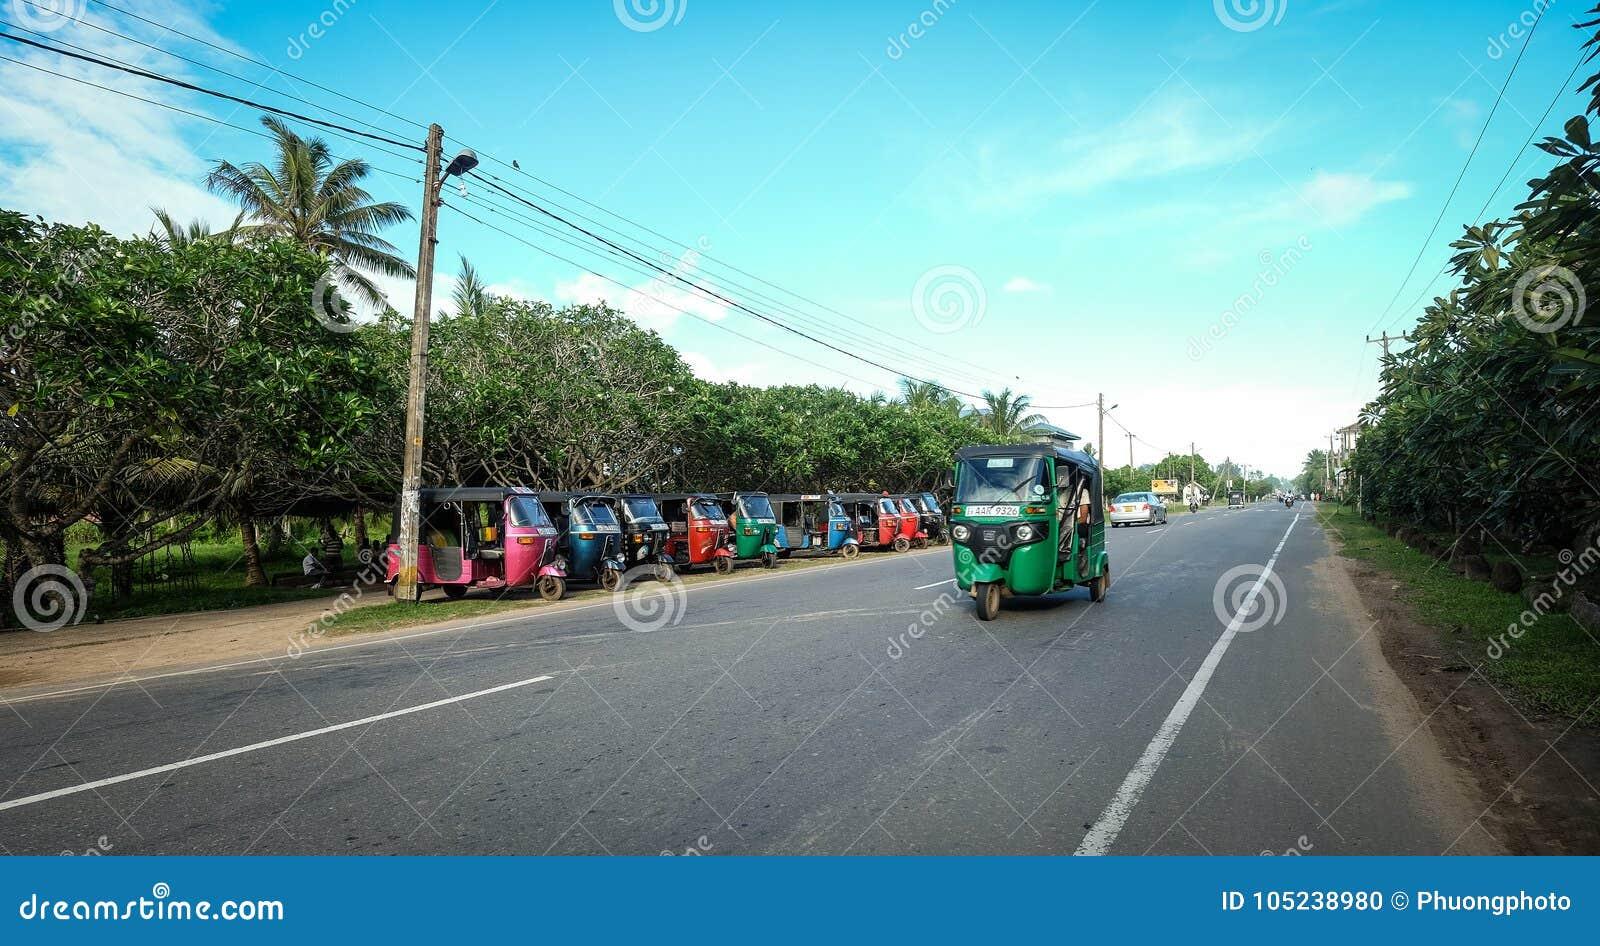 Free Images : landscape, tree, highway, mountain range, asphalt, autumn, lane, road trip